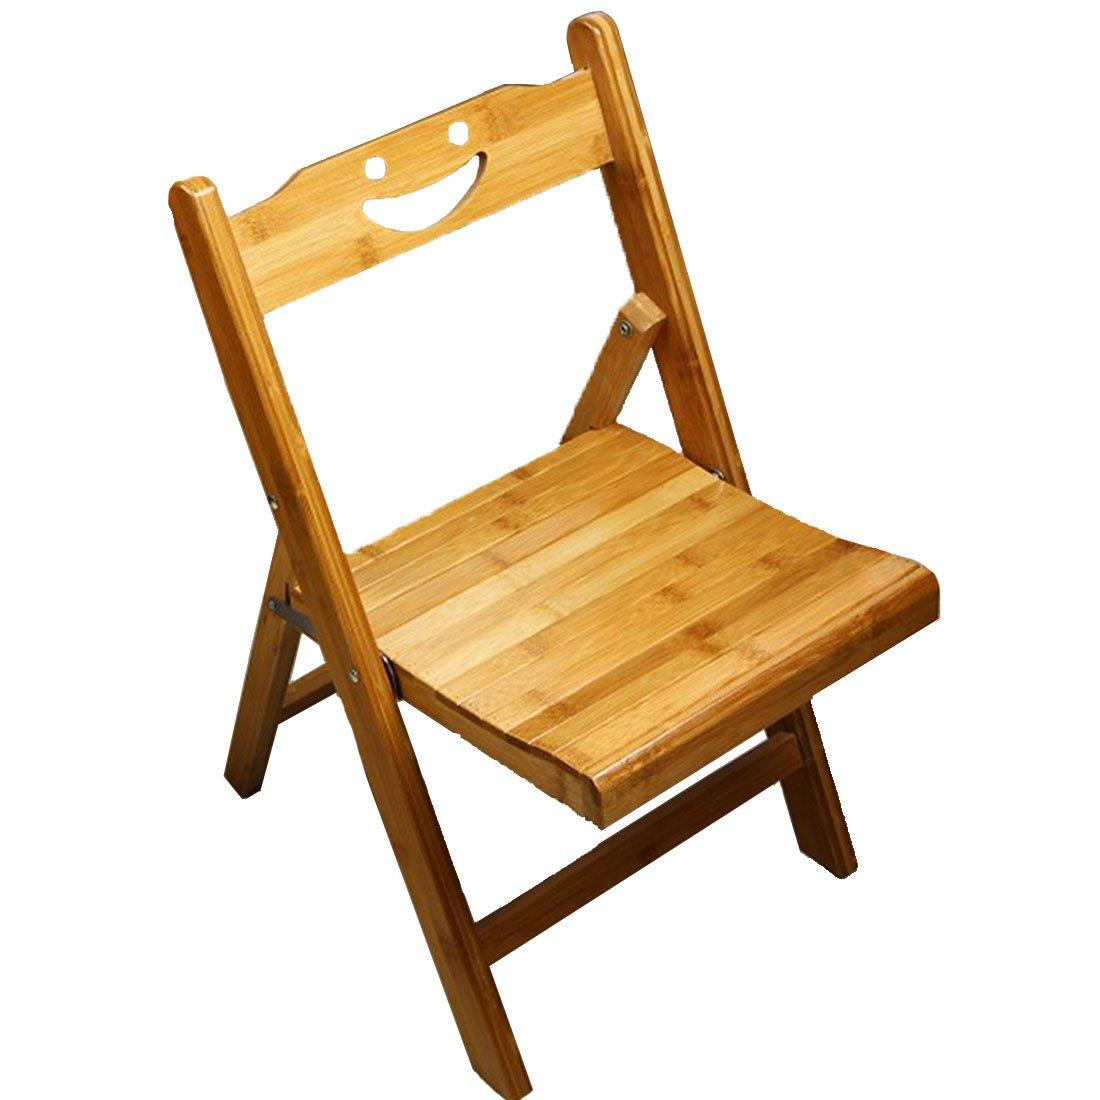 YIUHART Wood Portable Smile Folding Chairs (2)